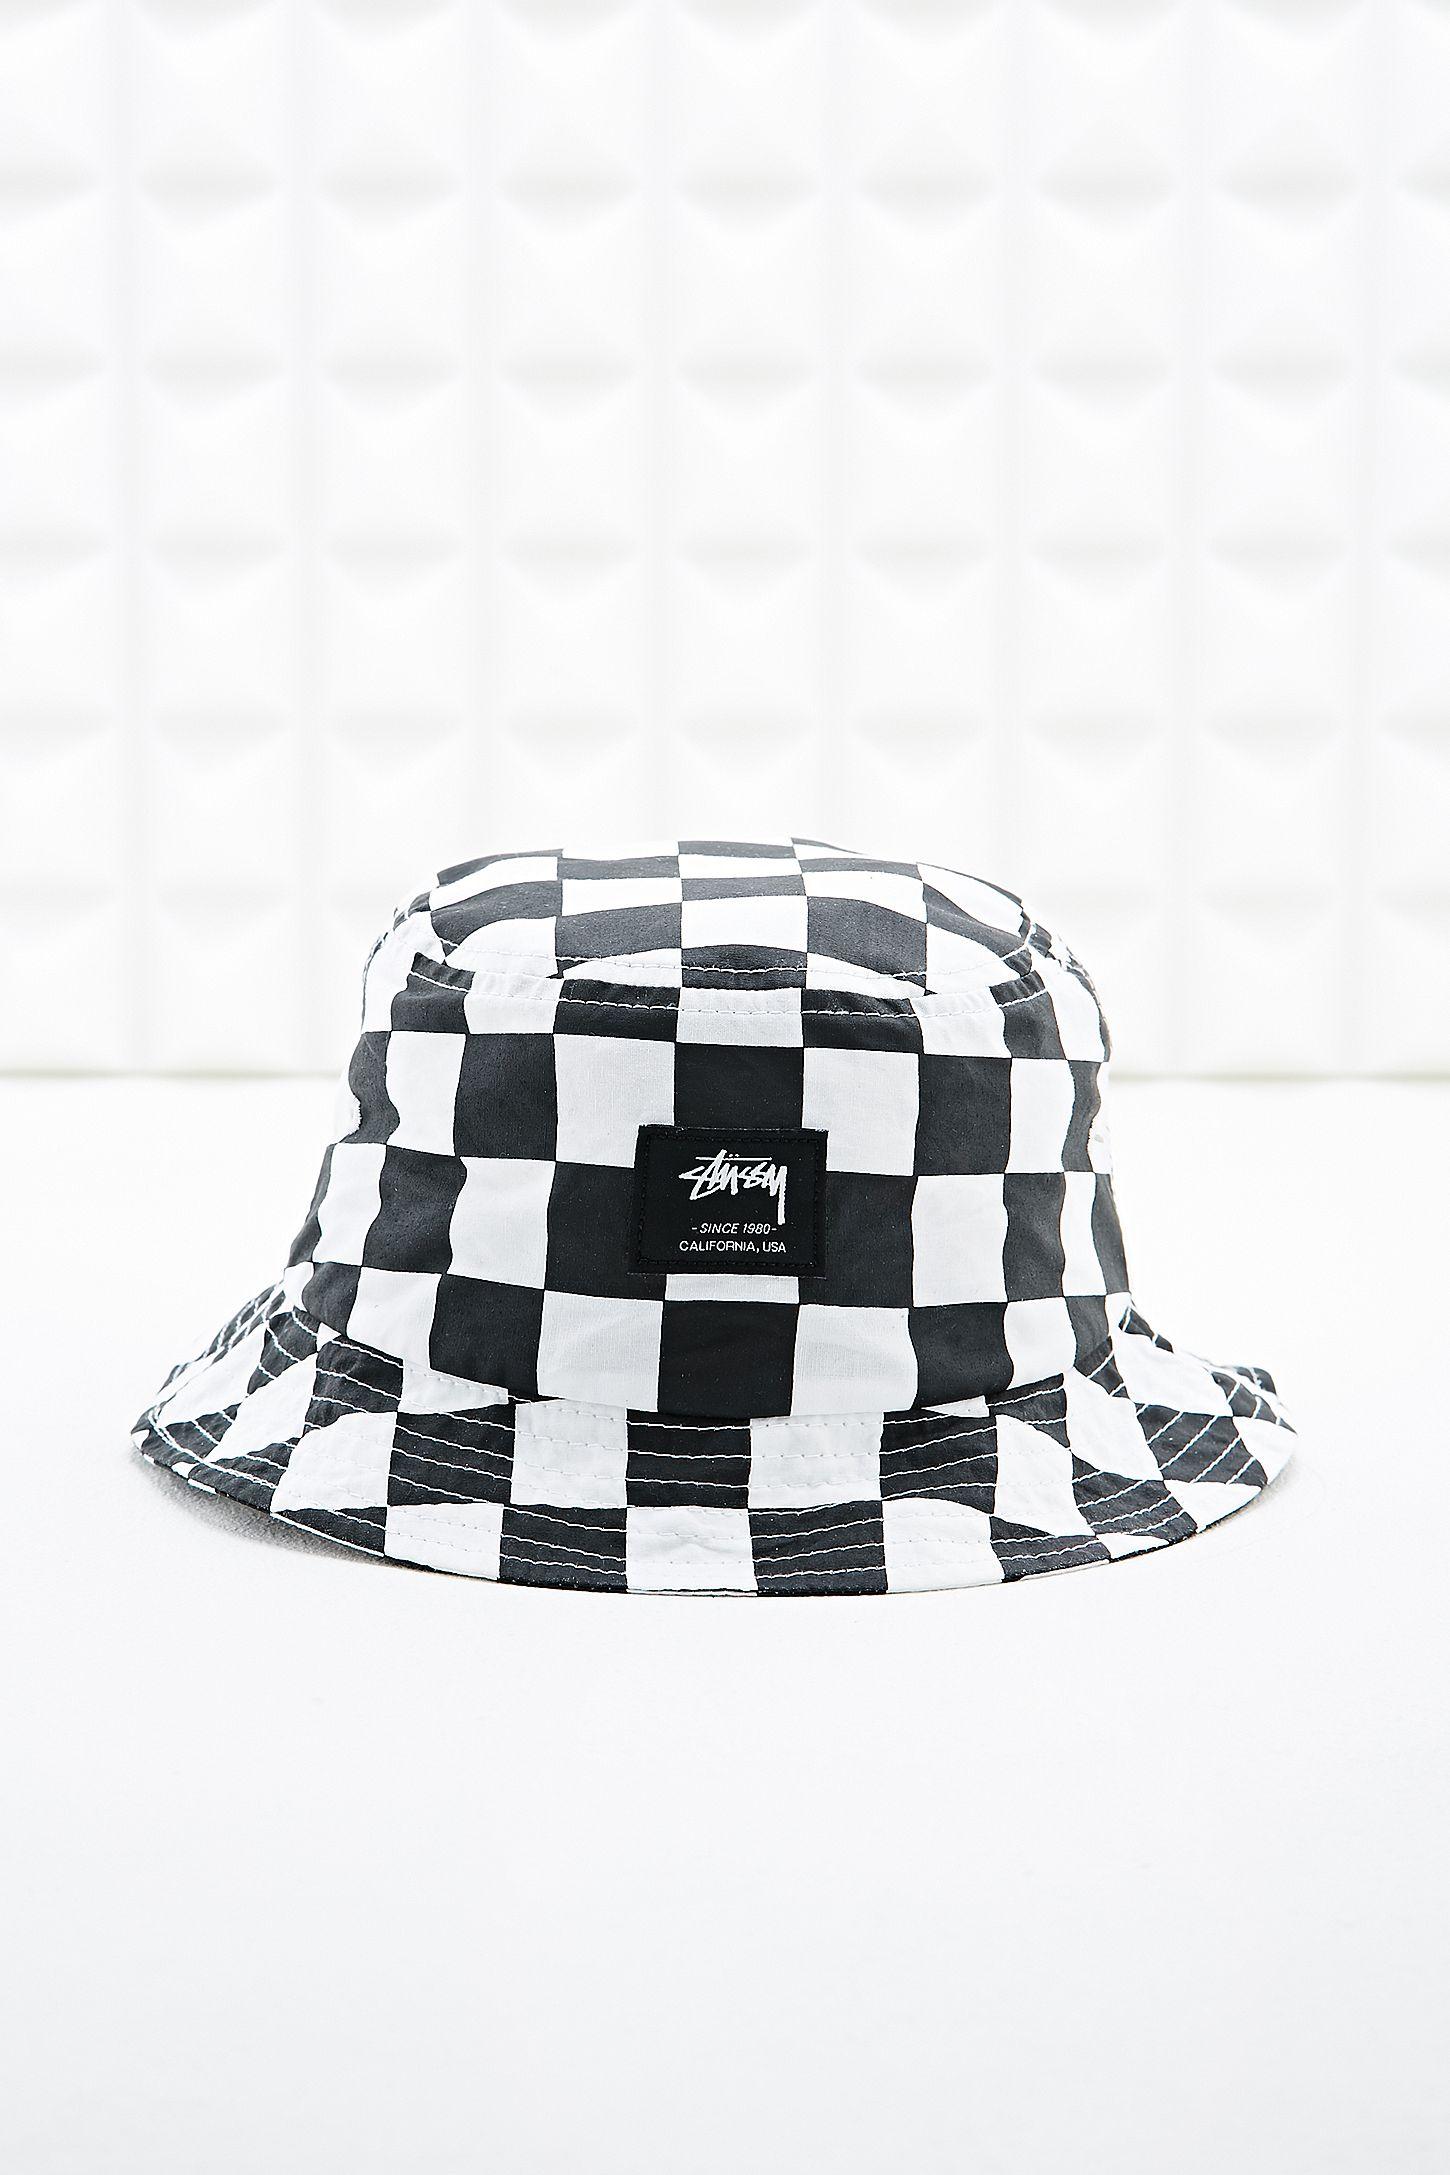 83d0df2fb62bc Stussy Bucket Hat in Checkerboard Print